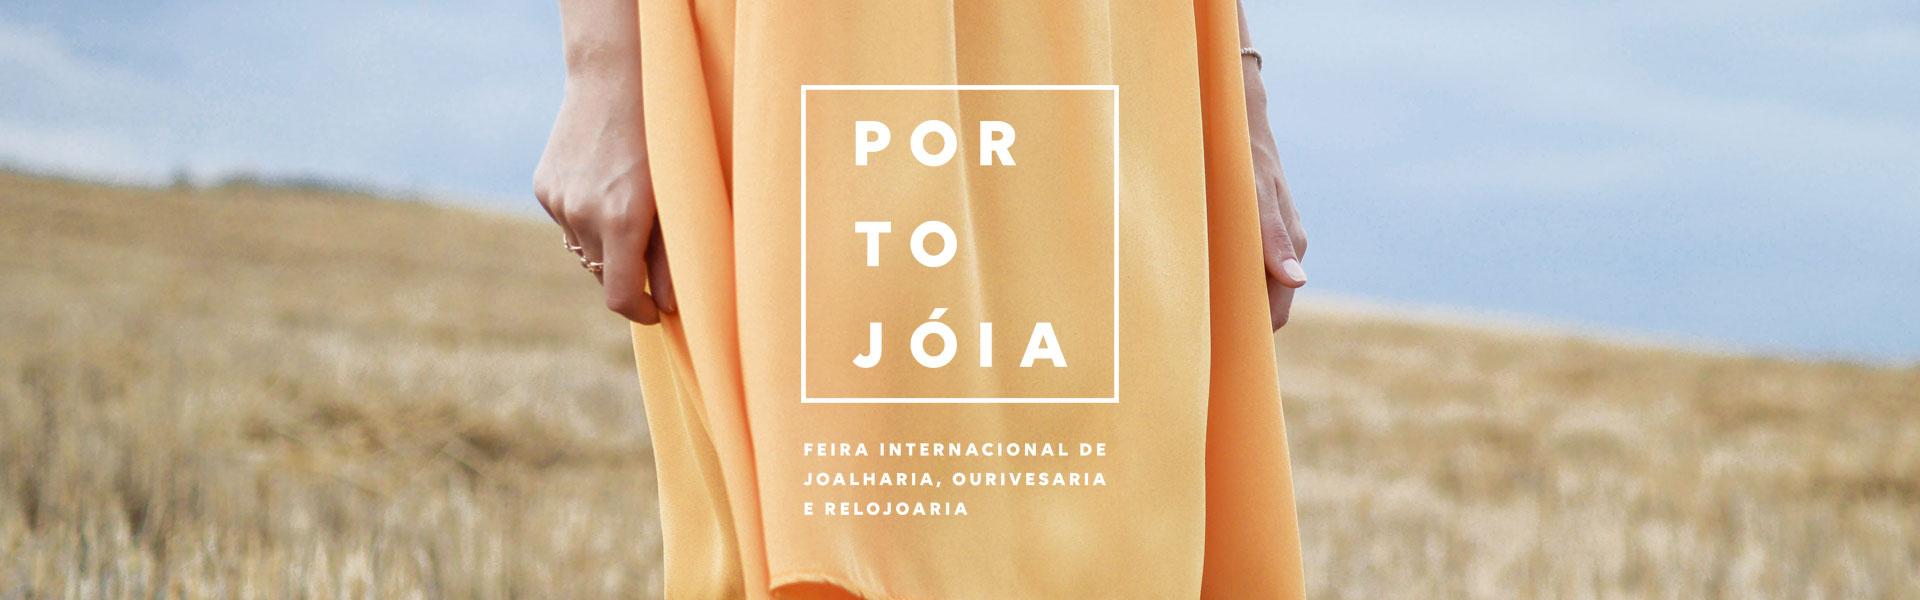 joalharia portuguesa